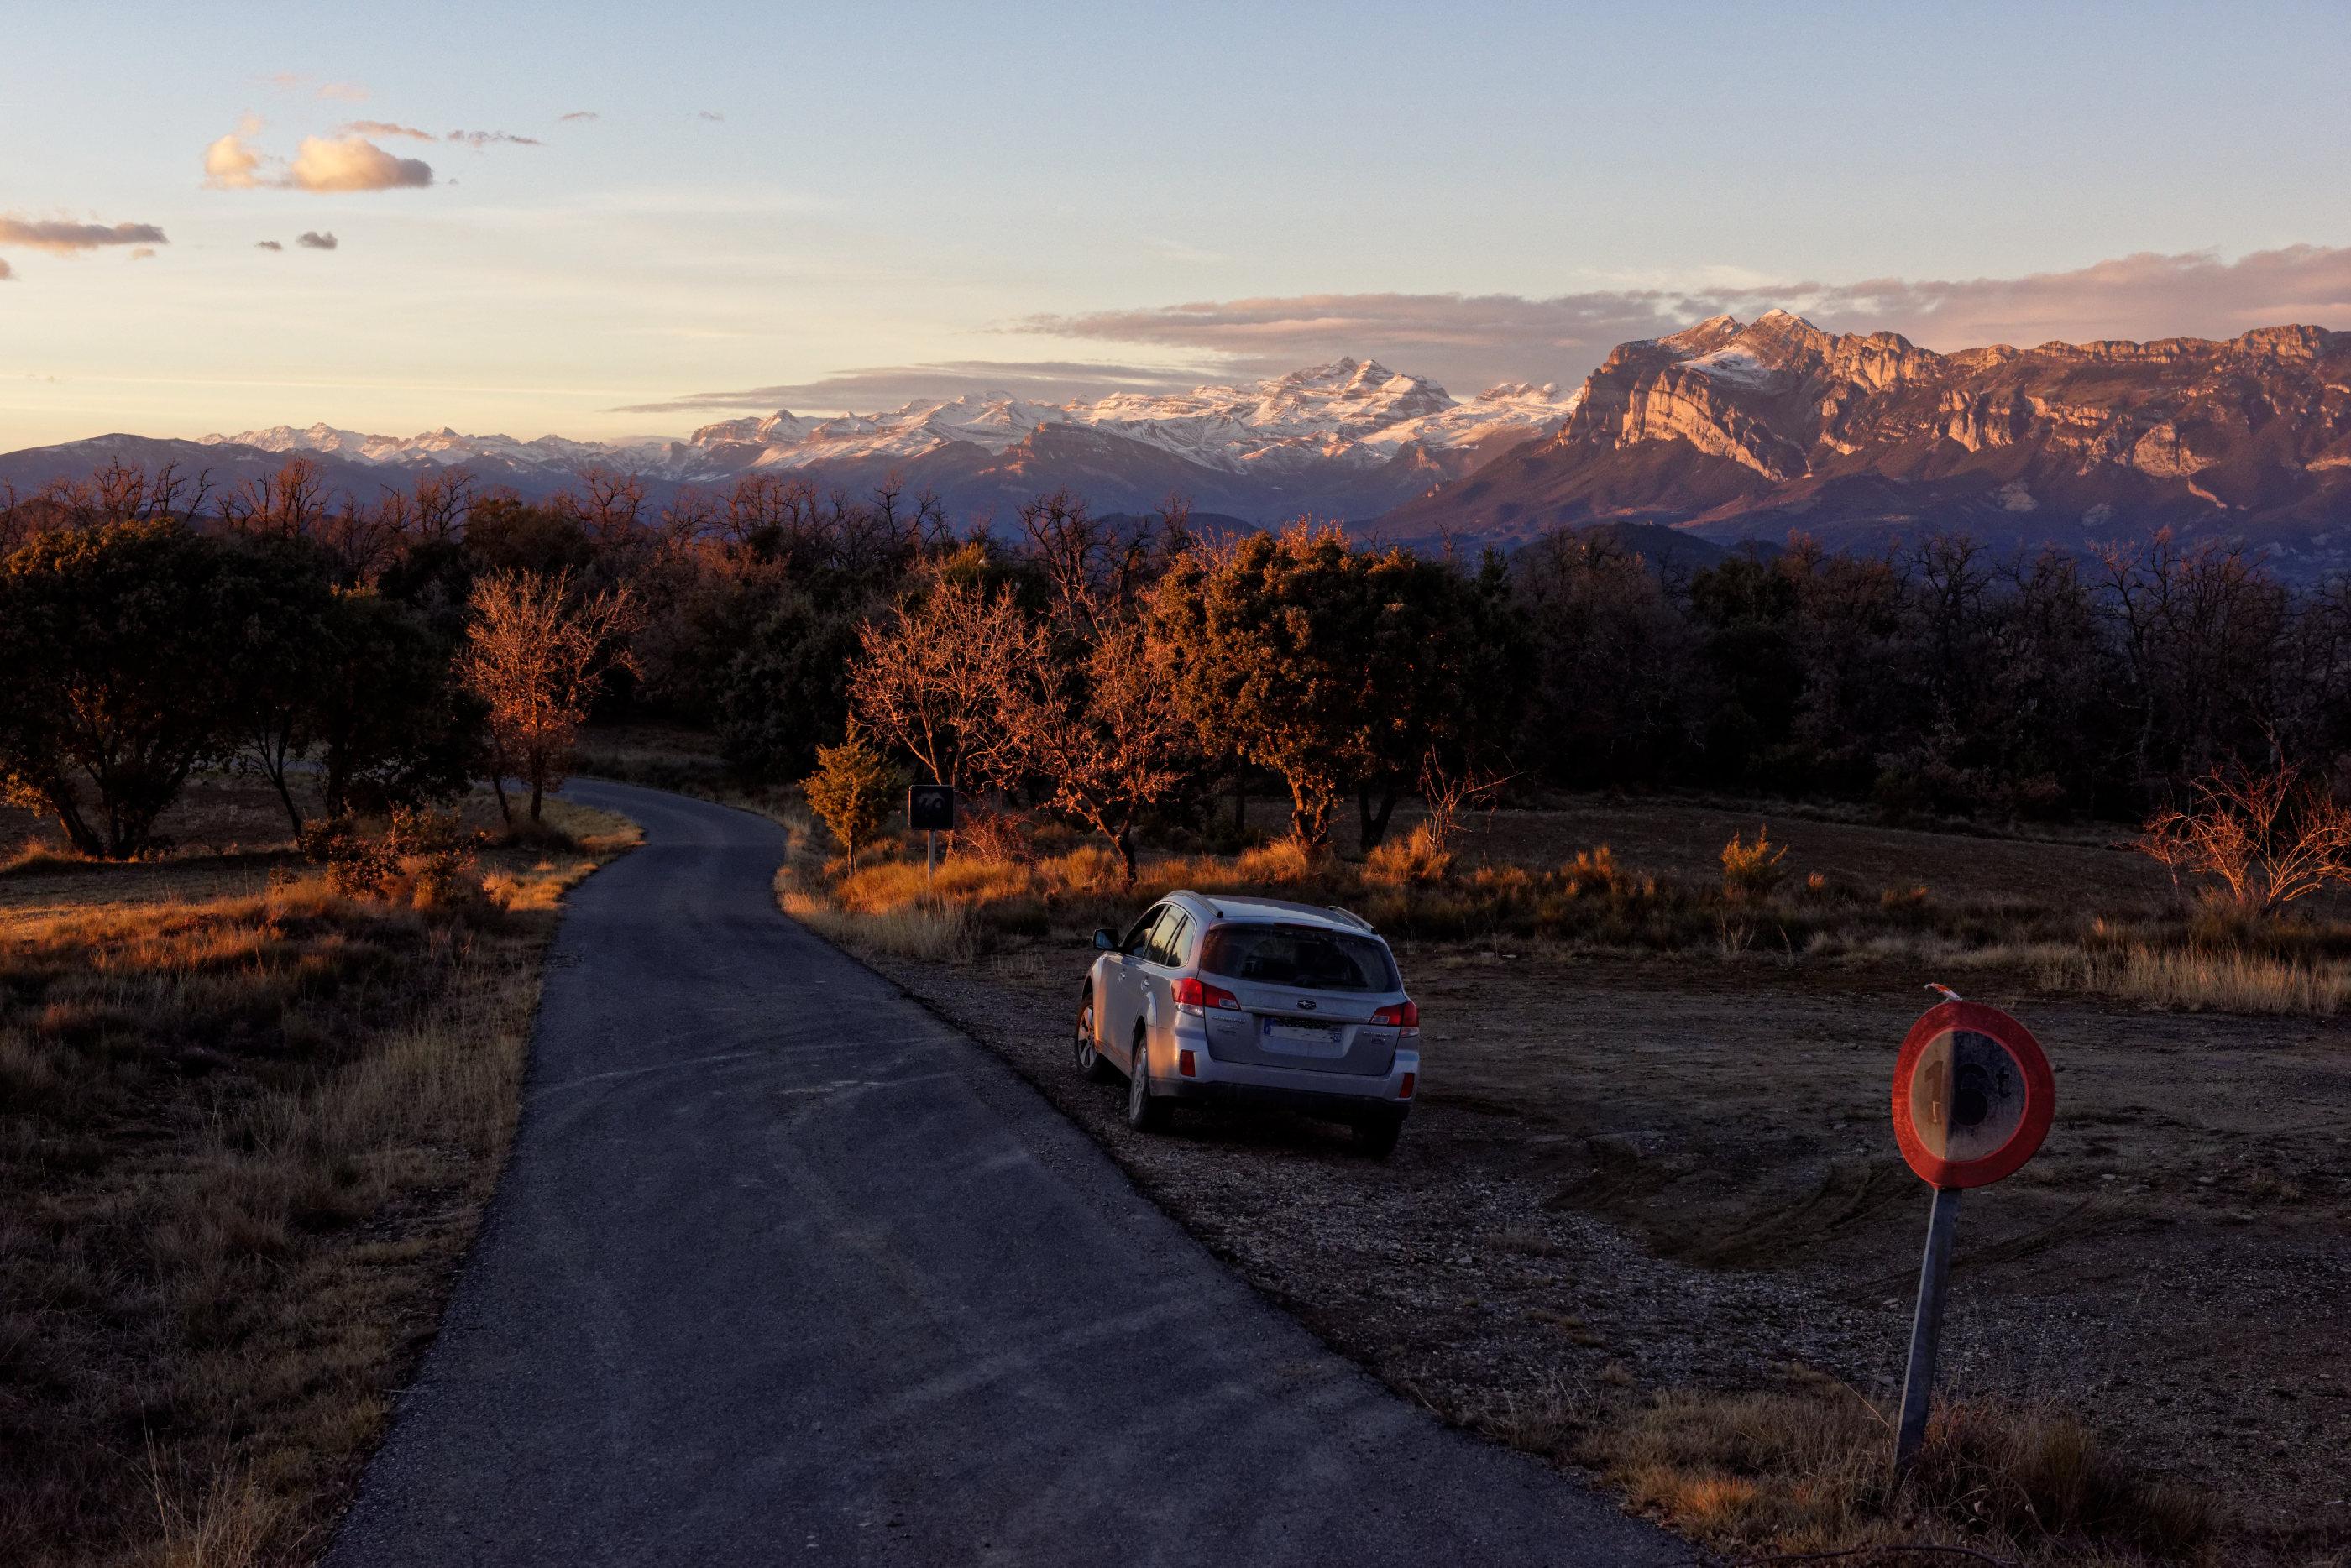 150125-Route de Trillo (Sobrarbe-La Fueva) (18)